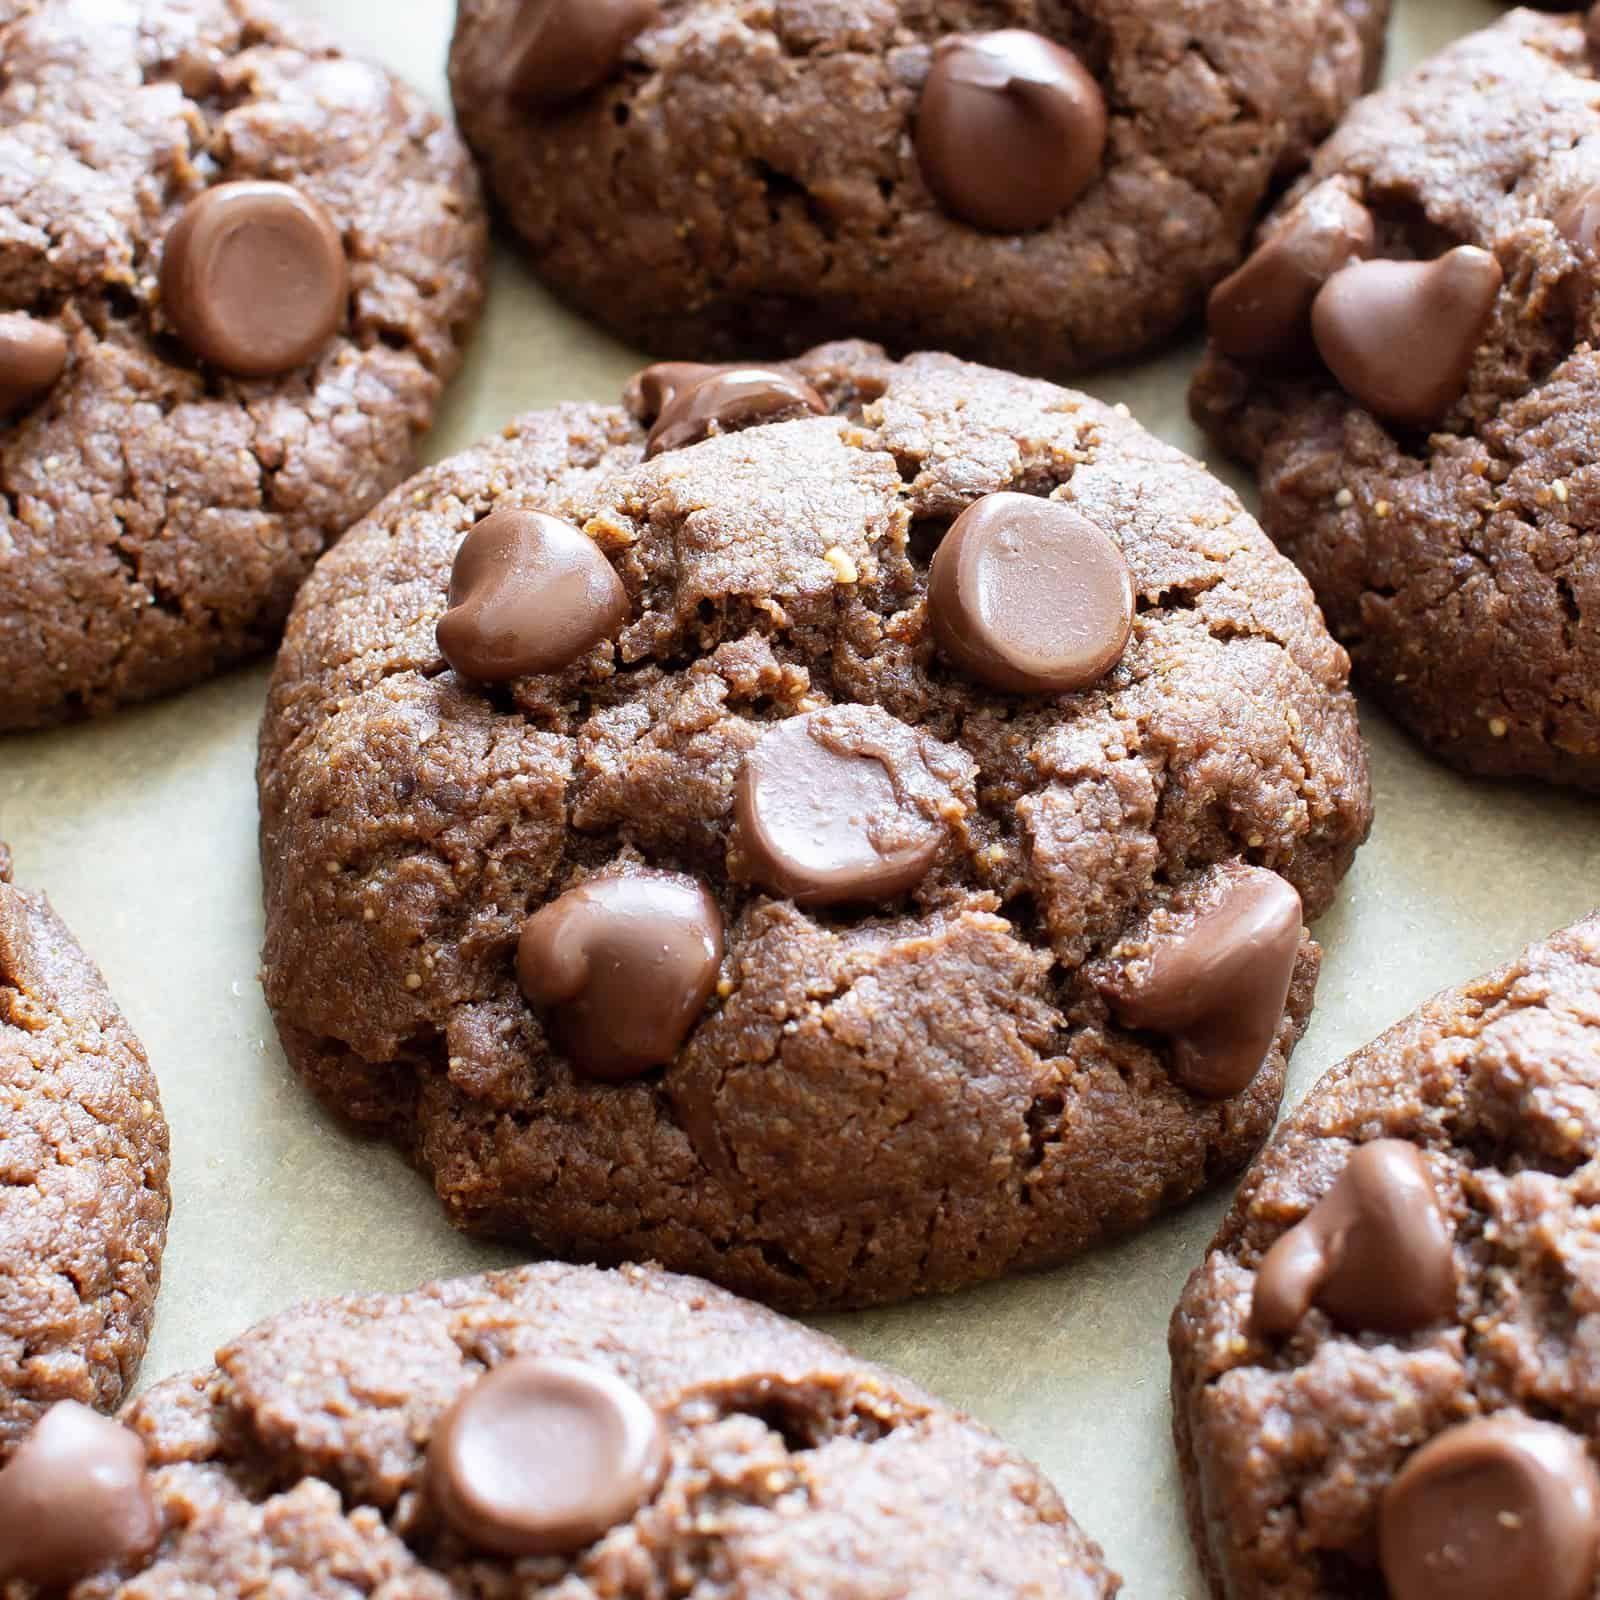 Gf Chocolate Tahini Cookies This Flourless Chocolate Chip Cookie